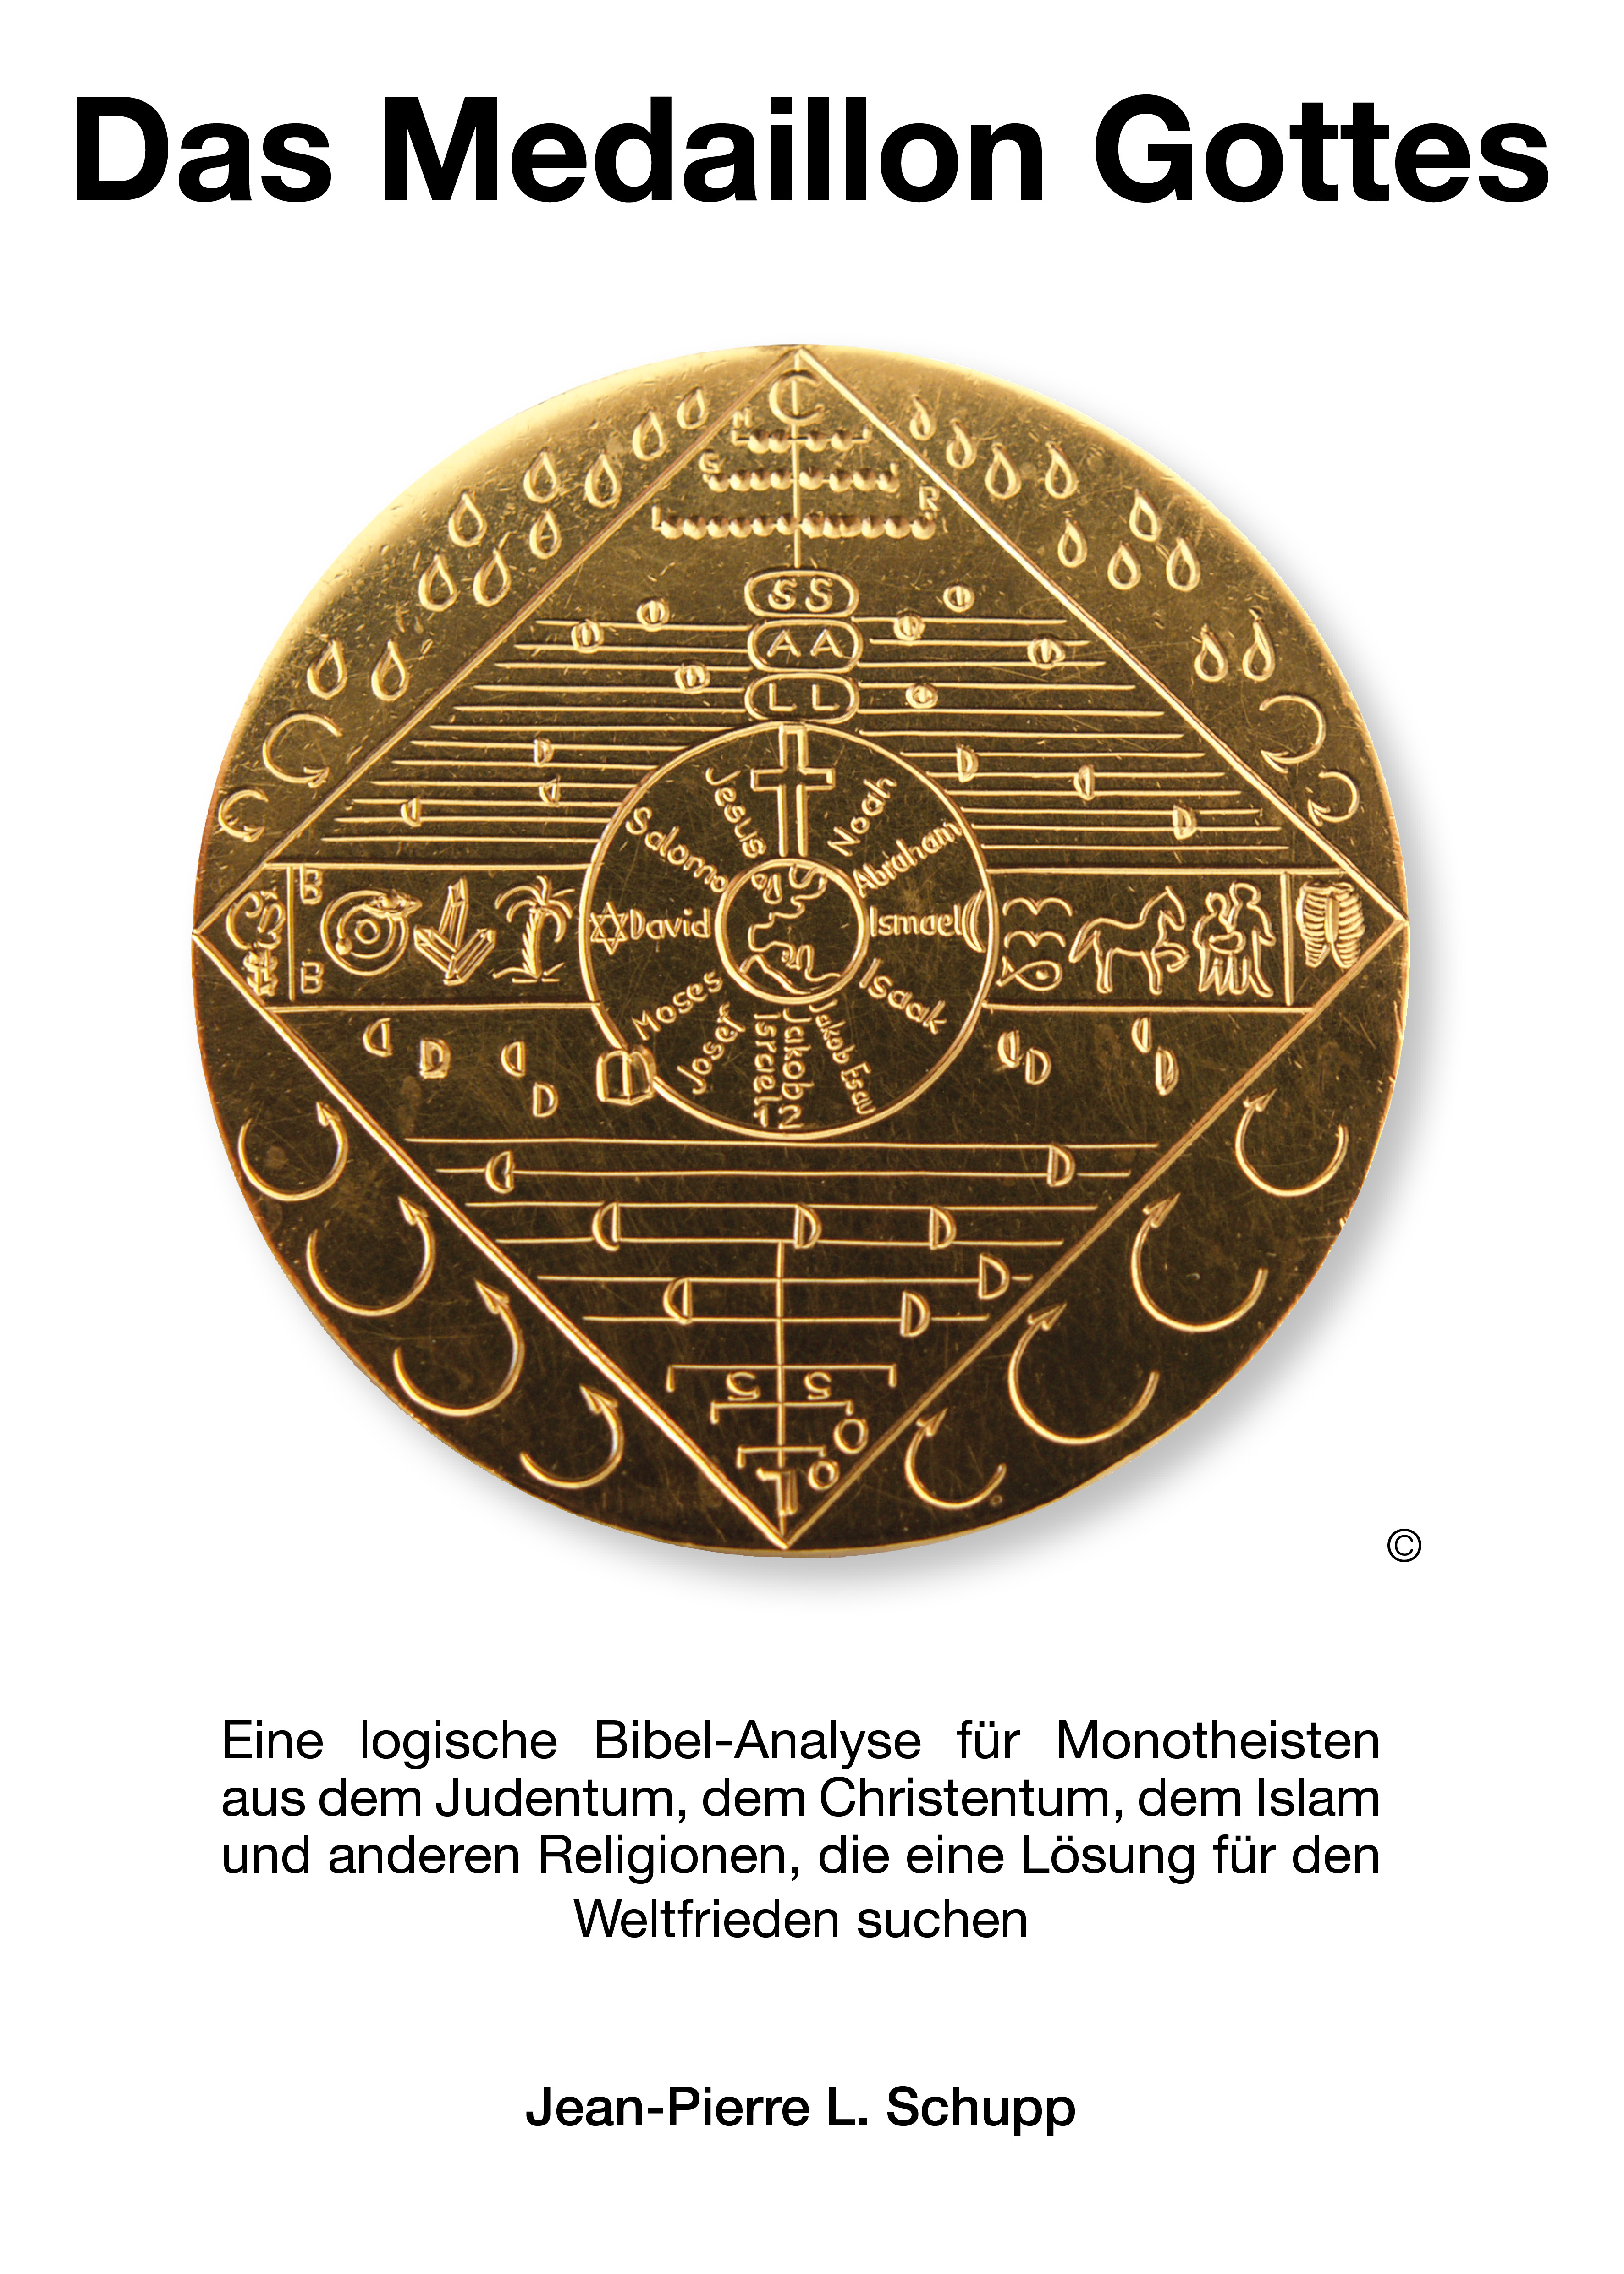 Das Medaillon Gottes Jean-Pierre L. Schupp